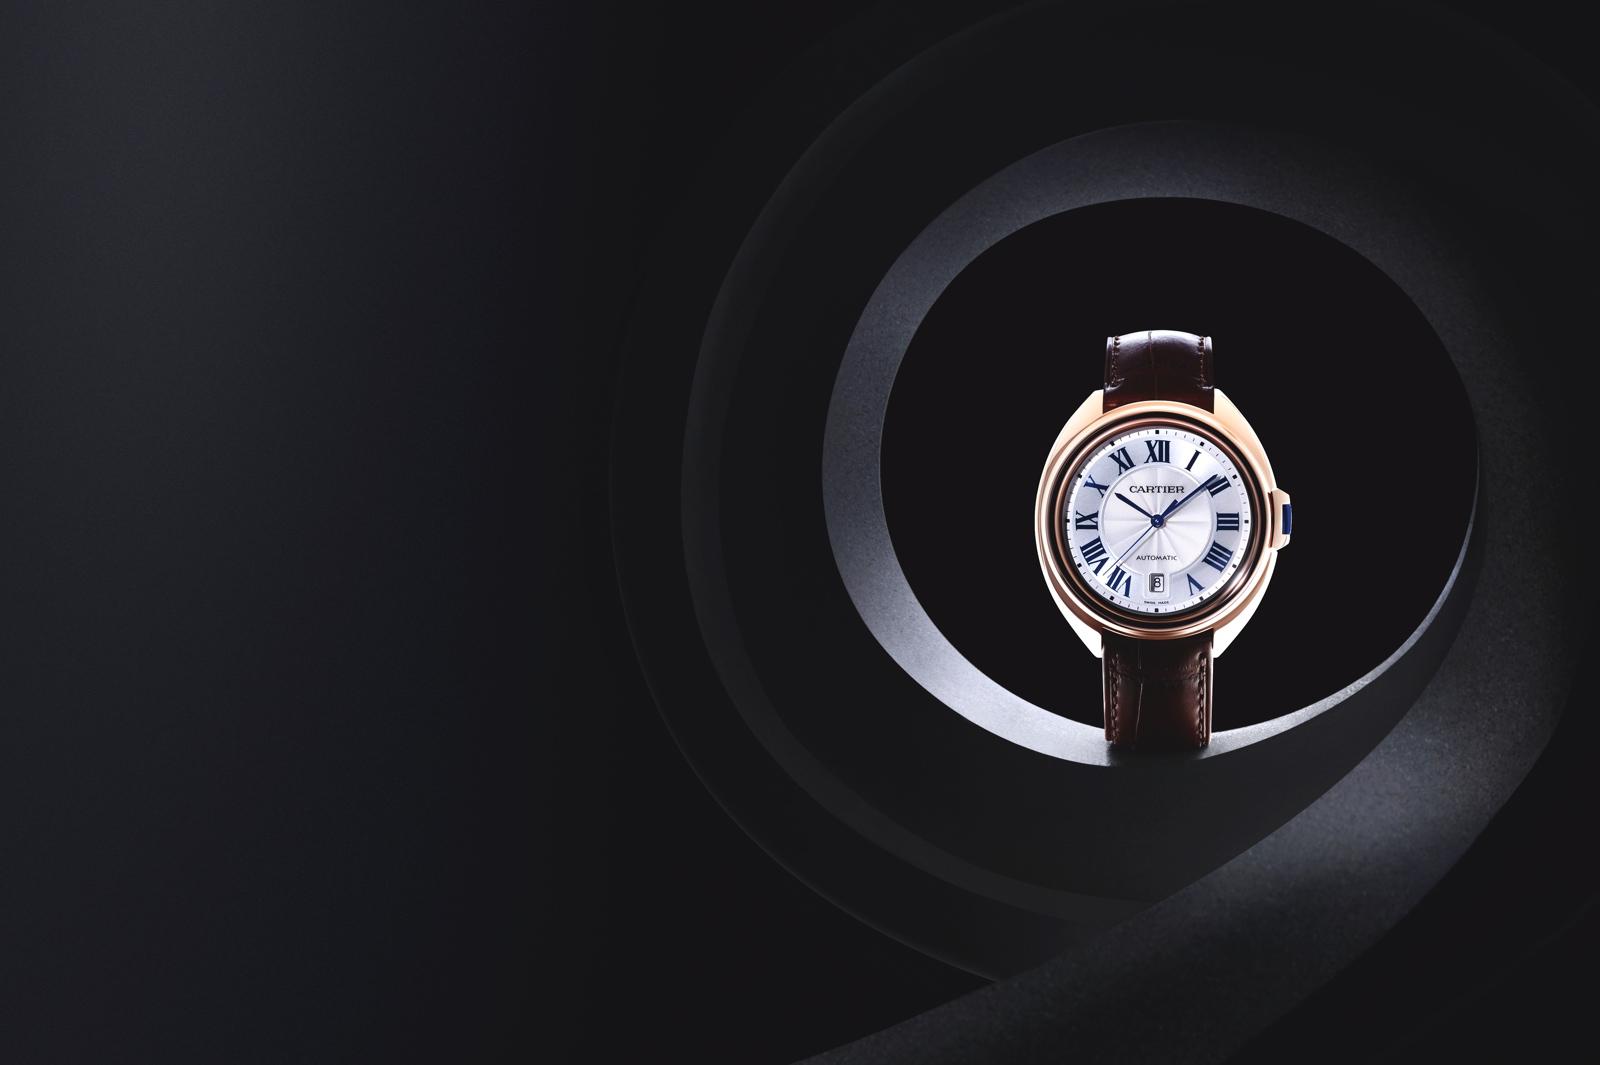 Clé de Cartier diseño